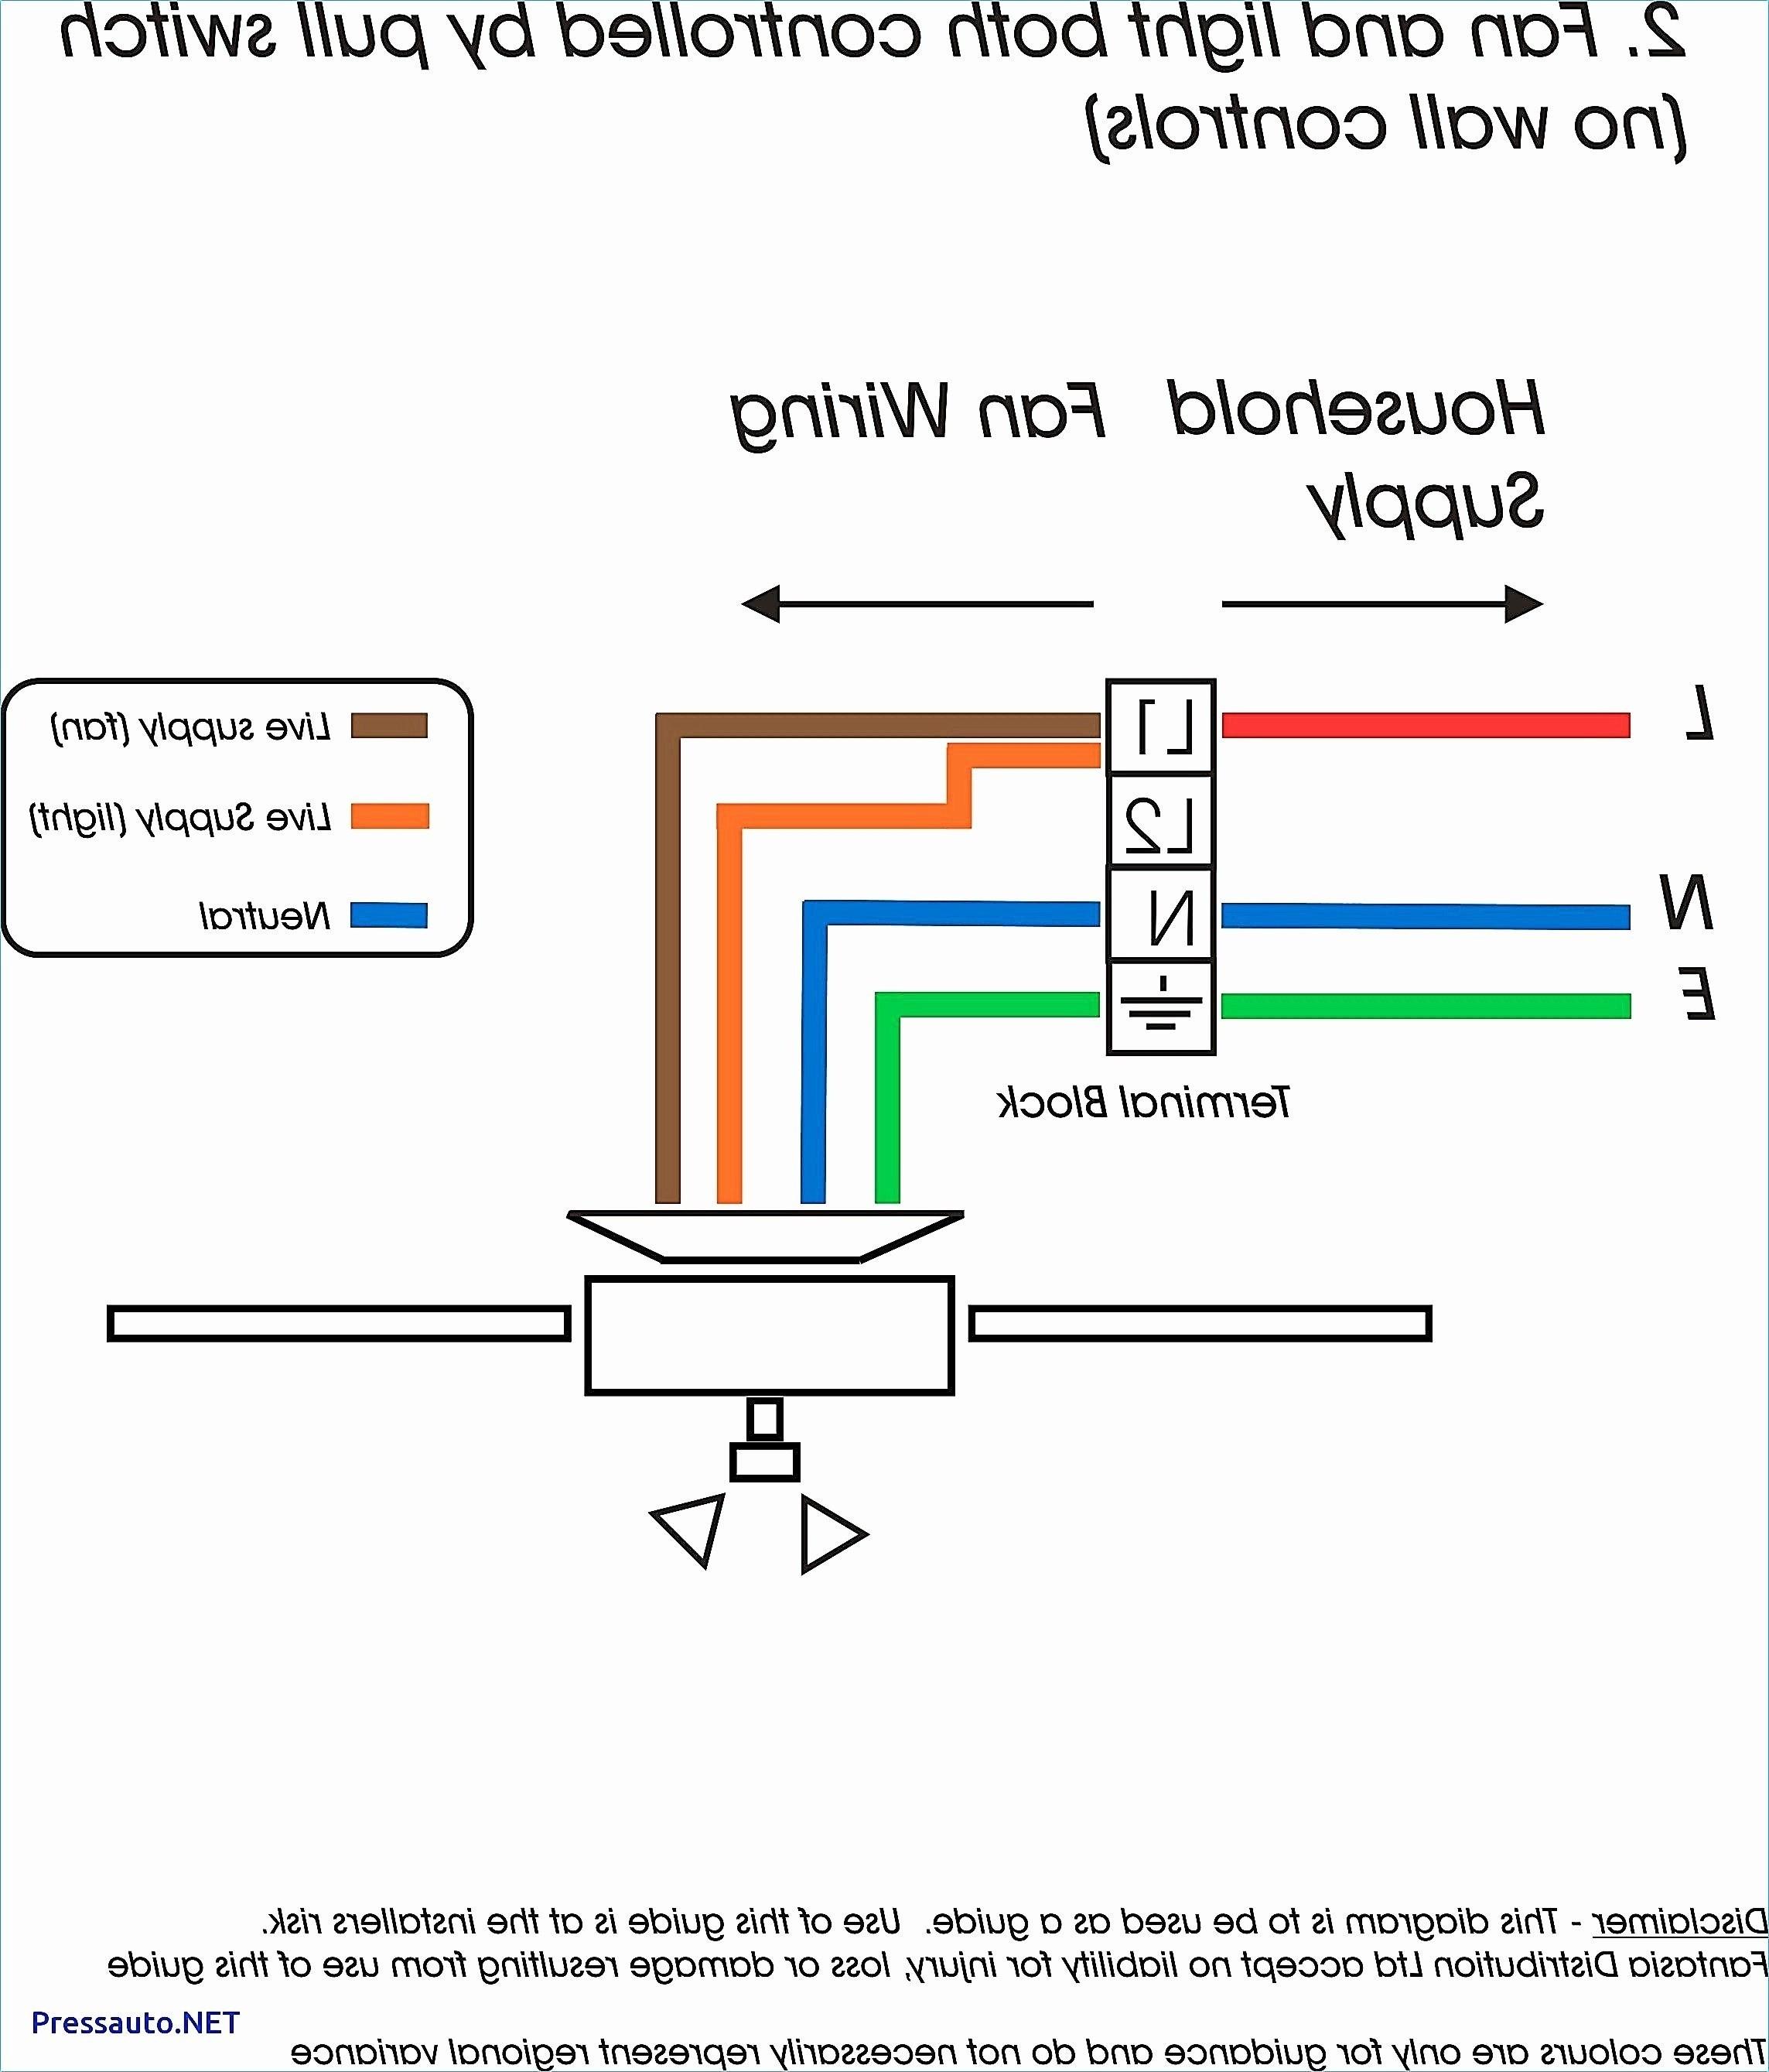 gfci receptacle wiring diagram Download-Leviton Gfci Wiring Diagram Fresh Wiring Diagram for Gfci Receptacle New Home Outlet Wiring Diagram 5-b